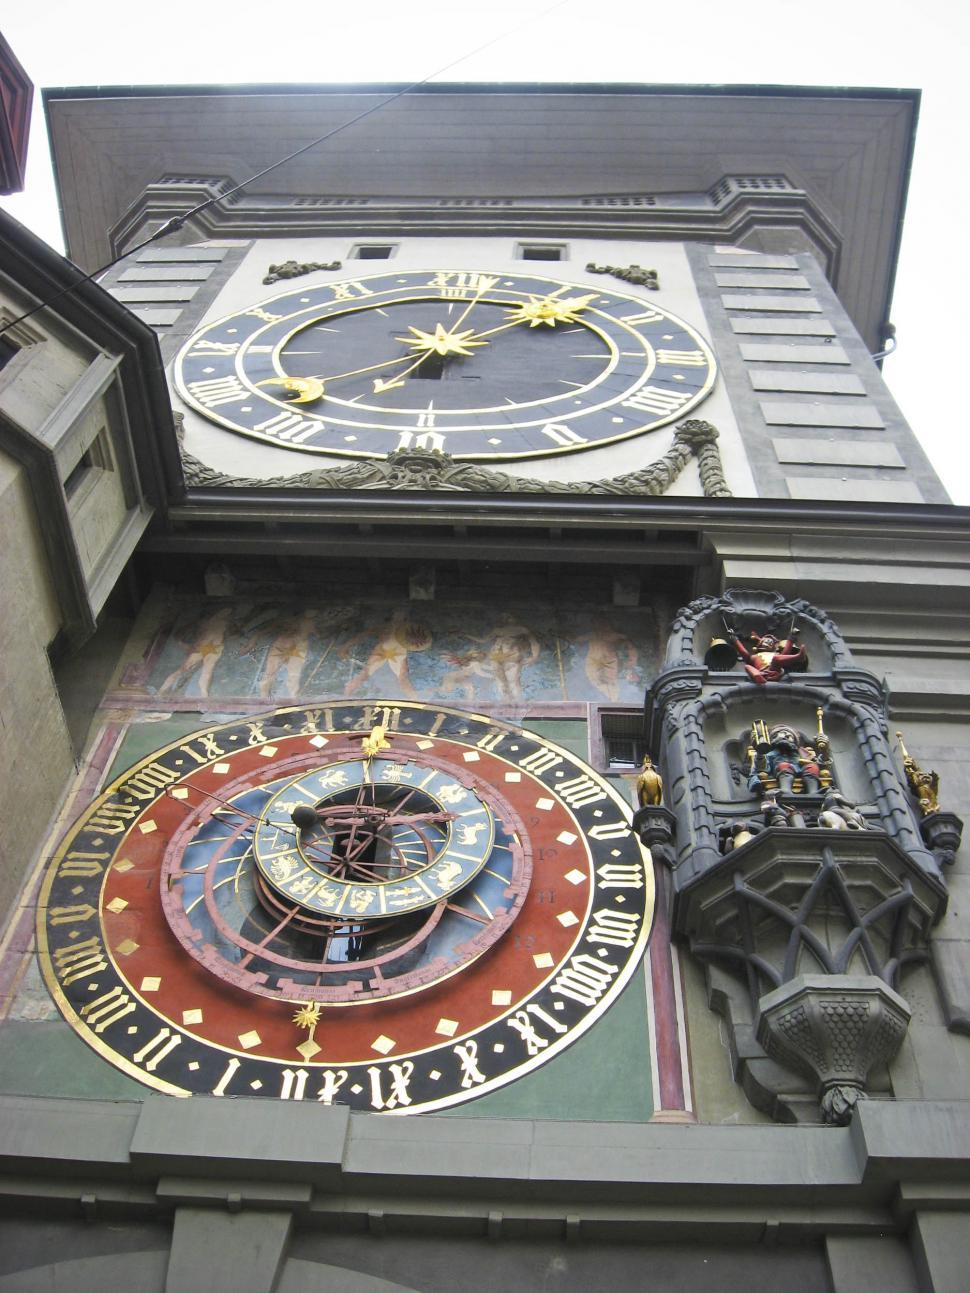 Download Free Stock Photo of Mechanical Clock in Bern, Switzerland